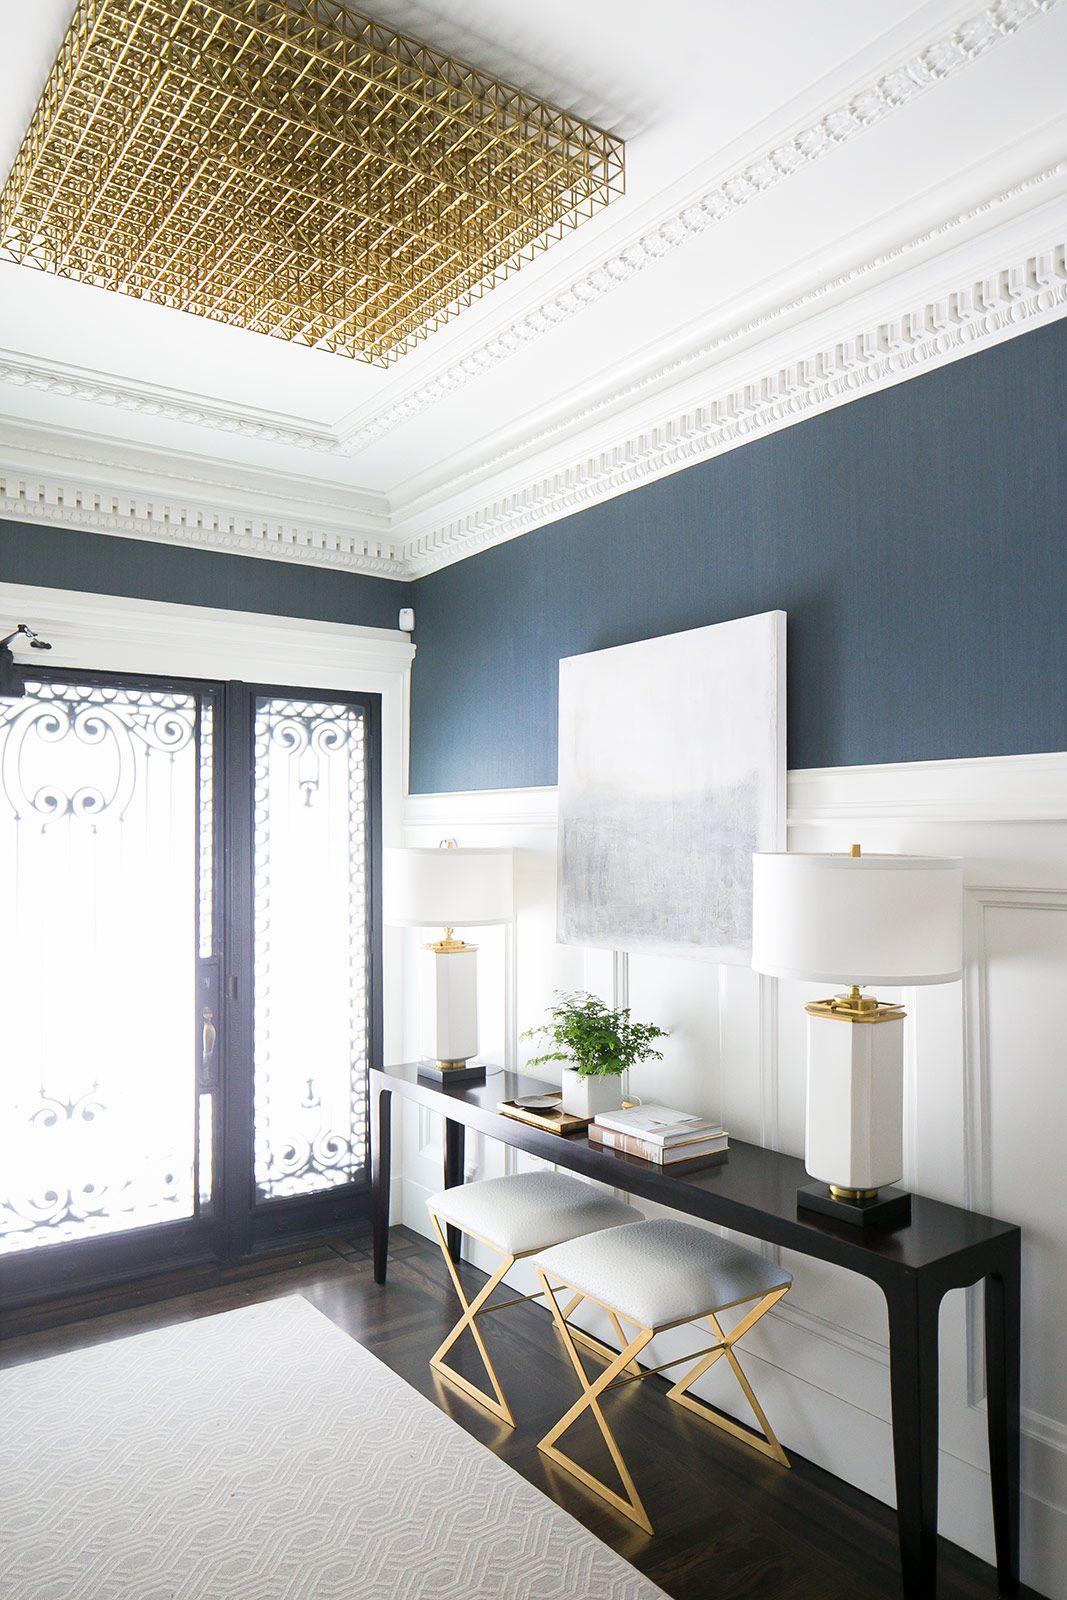 Navy hallway ideas  entry crisp details  Home decor  Pinterest  Grand entryway Green